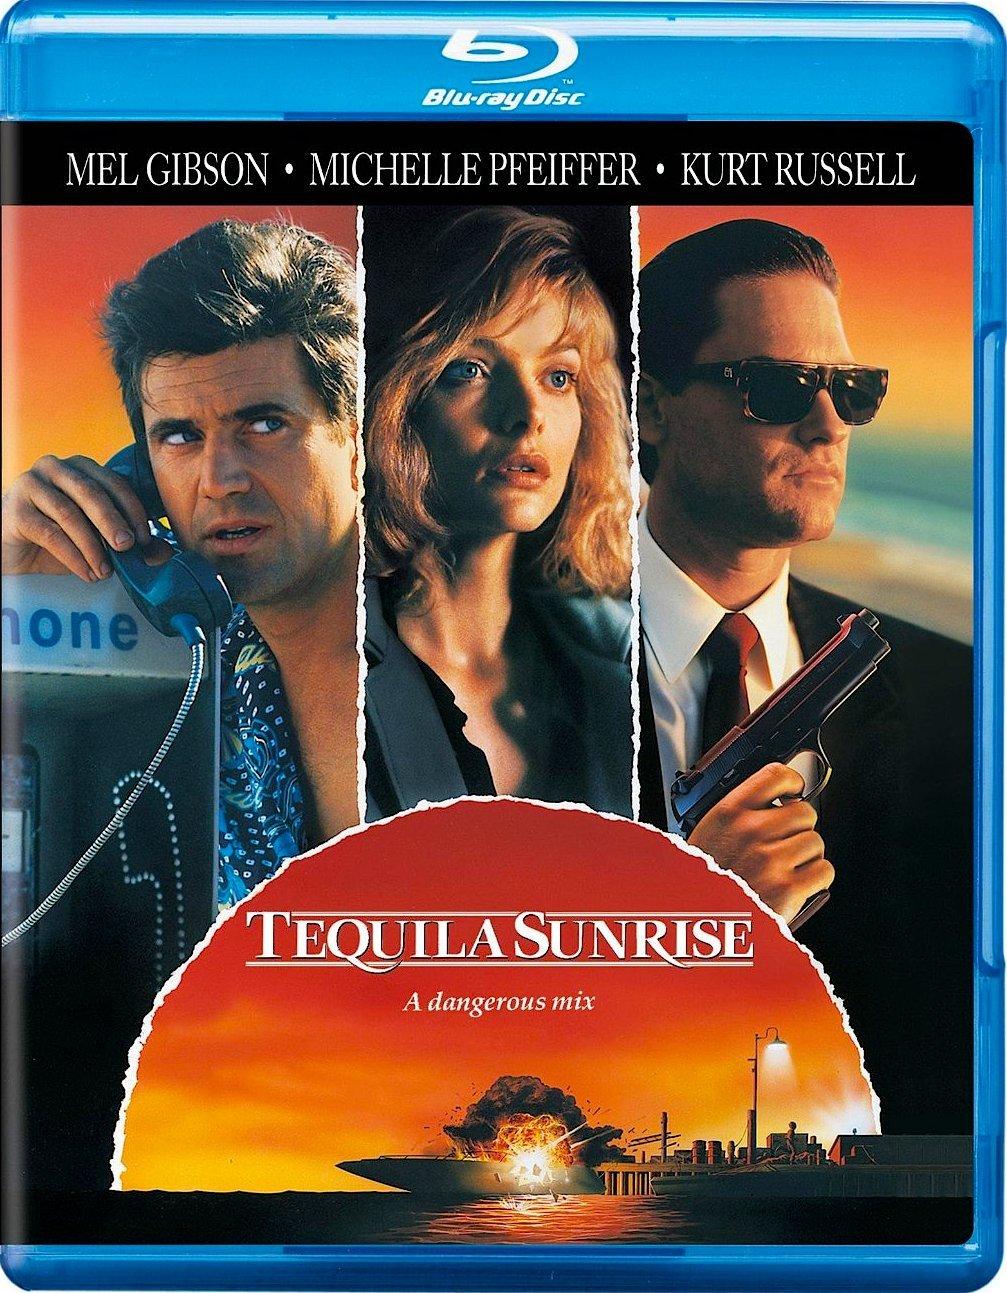 Tequila Sunrise Blu-ray